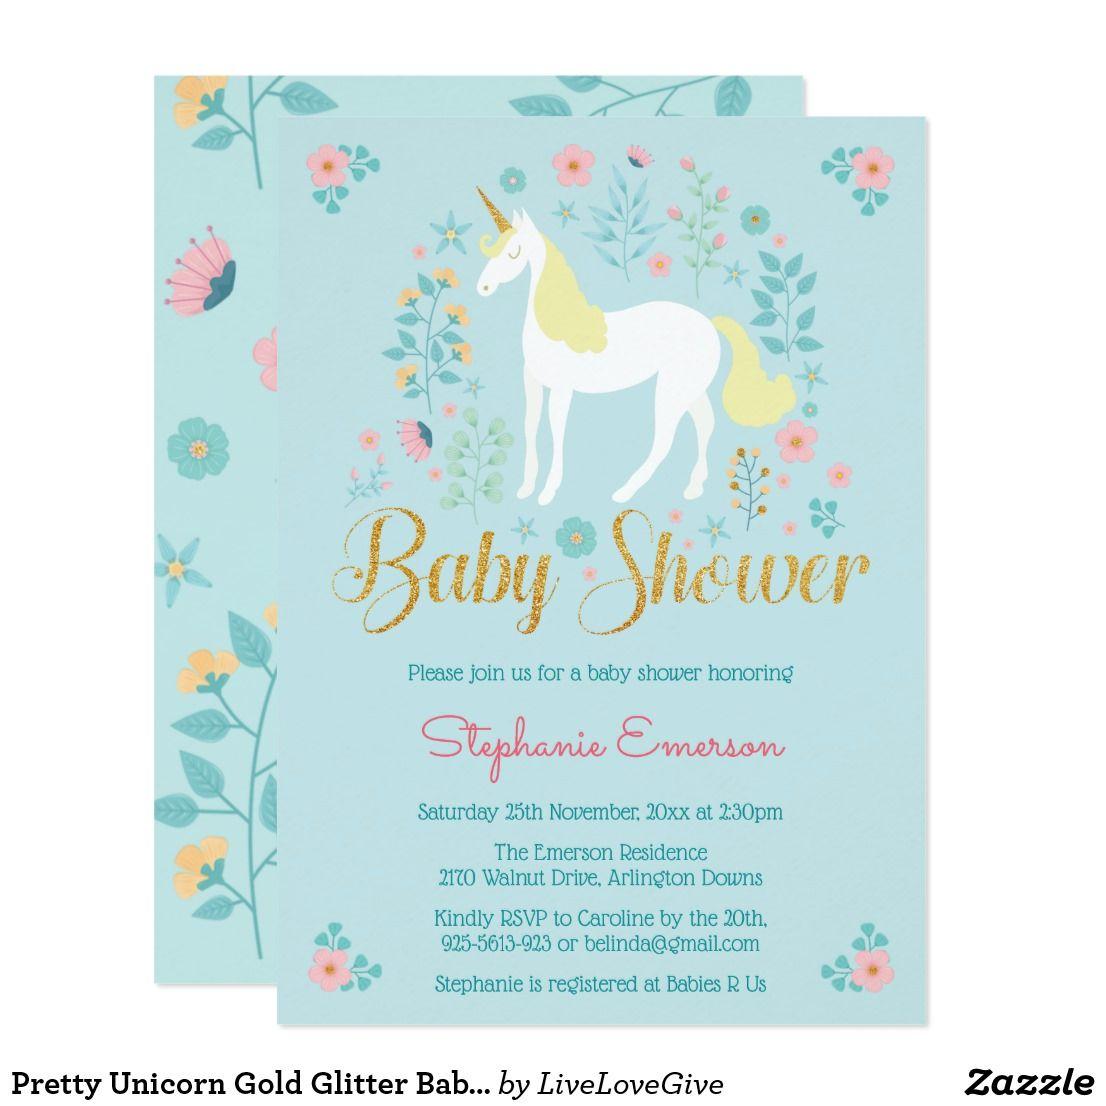 Pretty Unicorn Gold Glitter Baby Shower Invitation